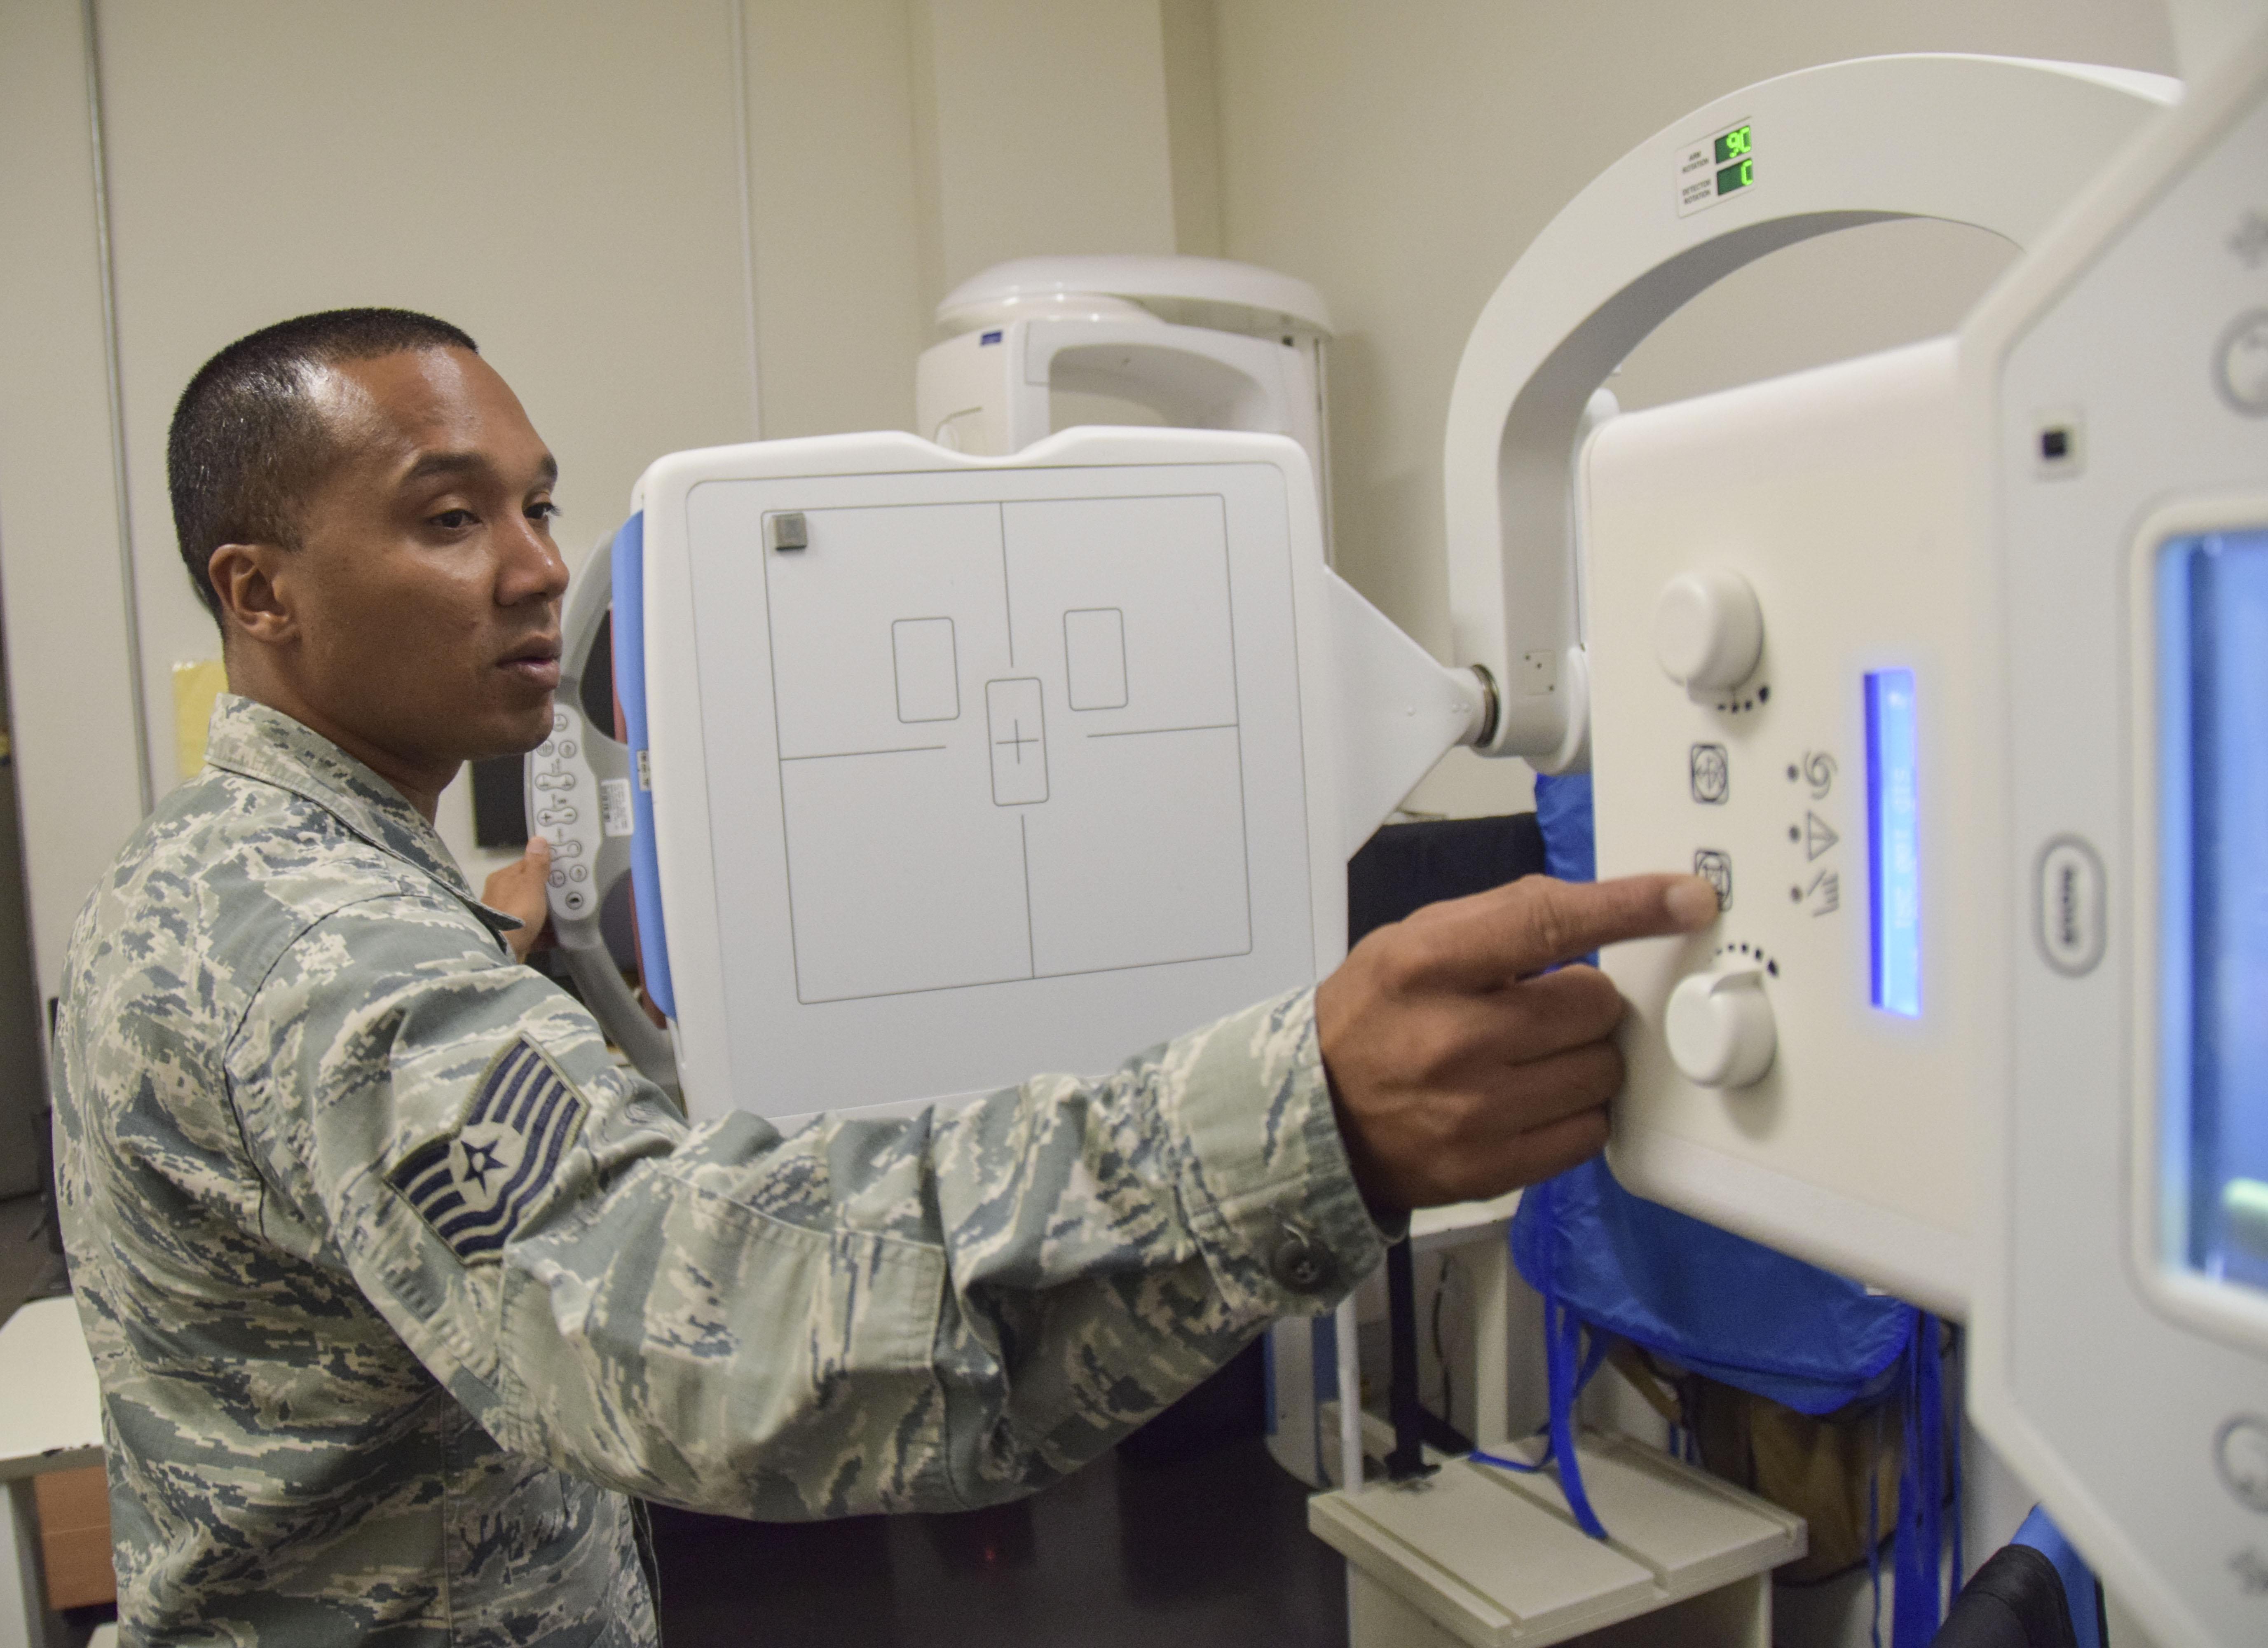 Meet AUAB medical group's MacGyver > Air Force Medical Service > Display